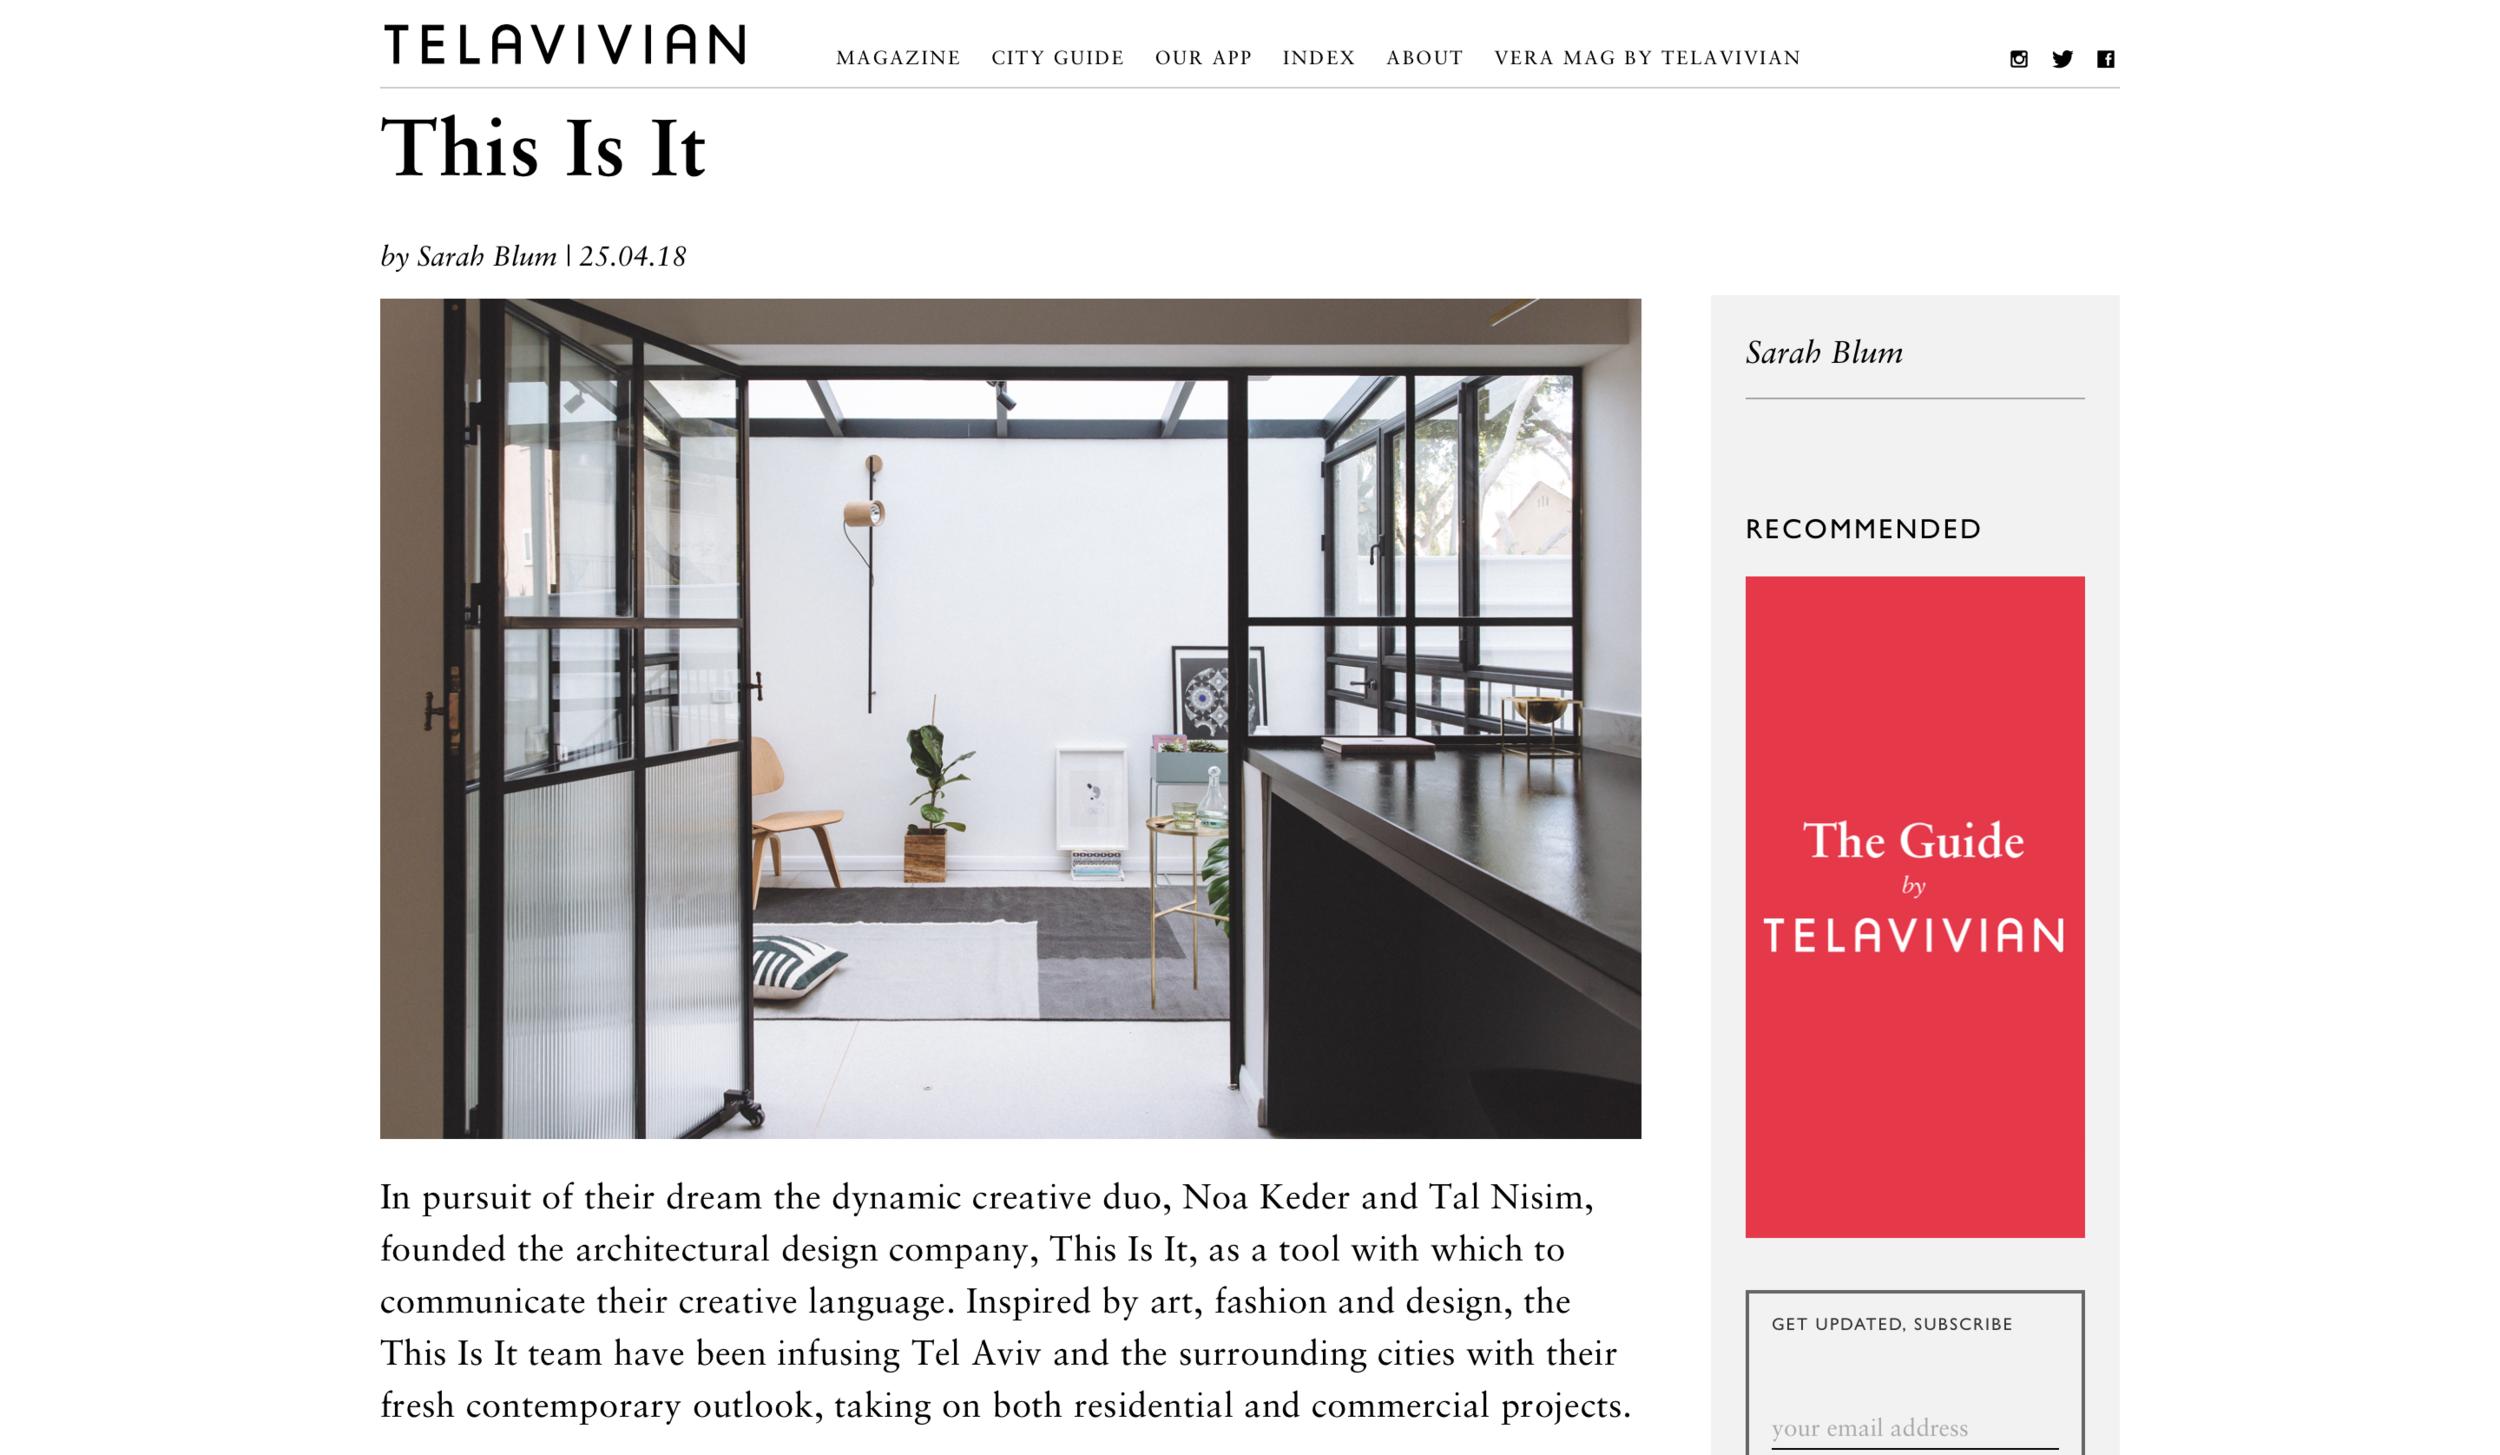 Telavivian.com